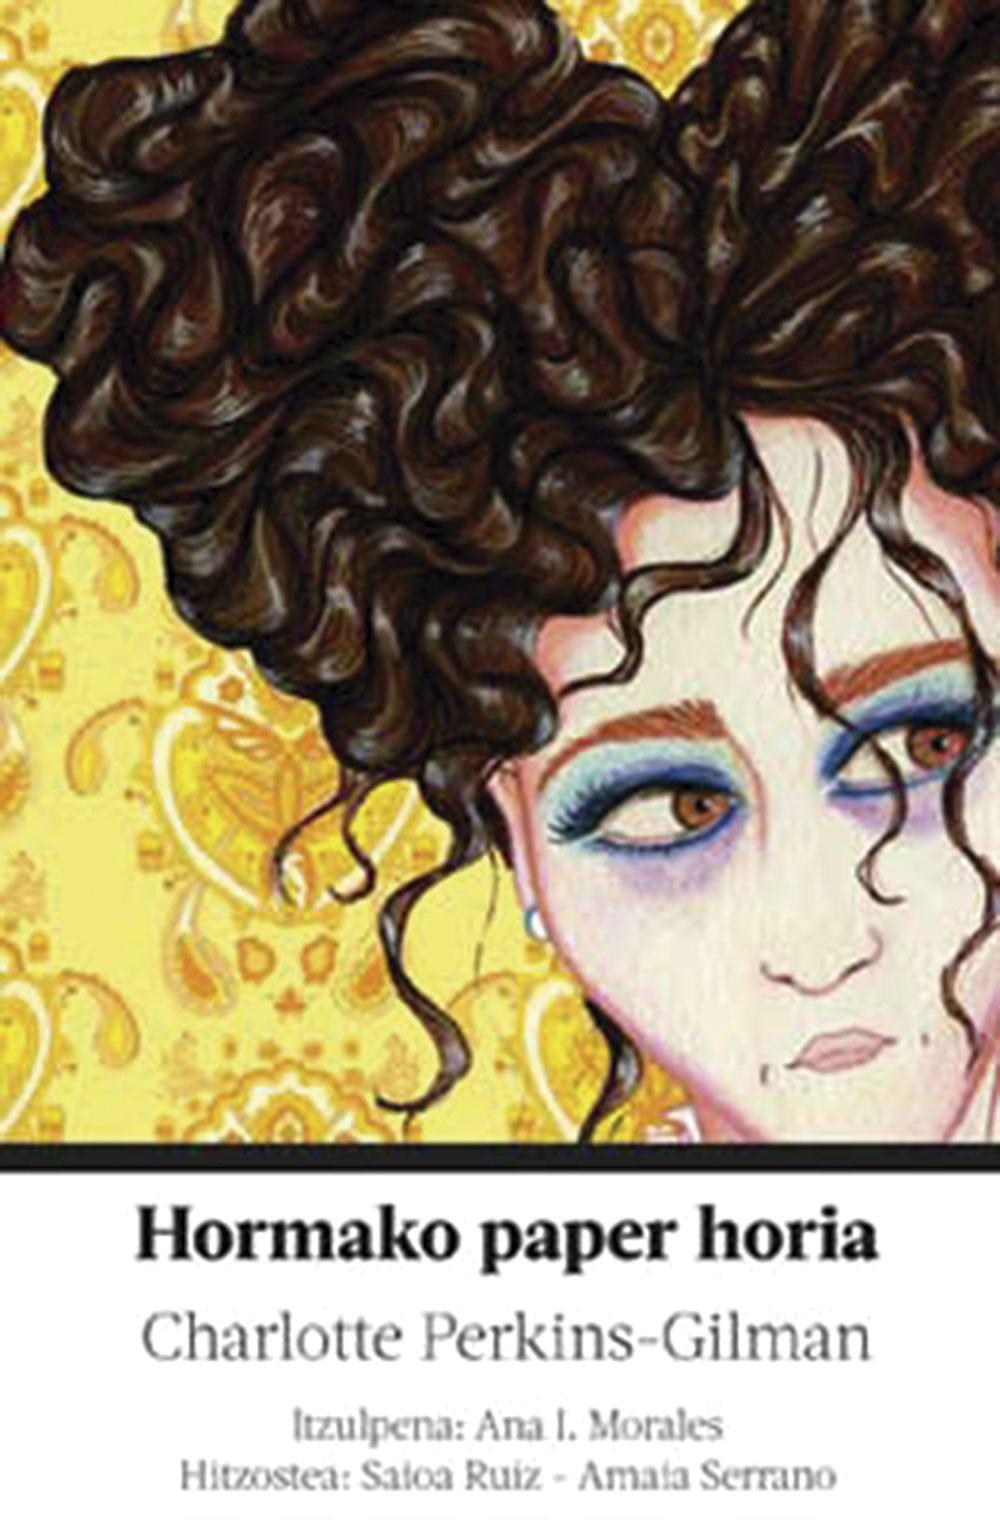 Charlotte Perkins Gilman | Hormako paper horia | EDO!, 2012.